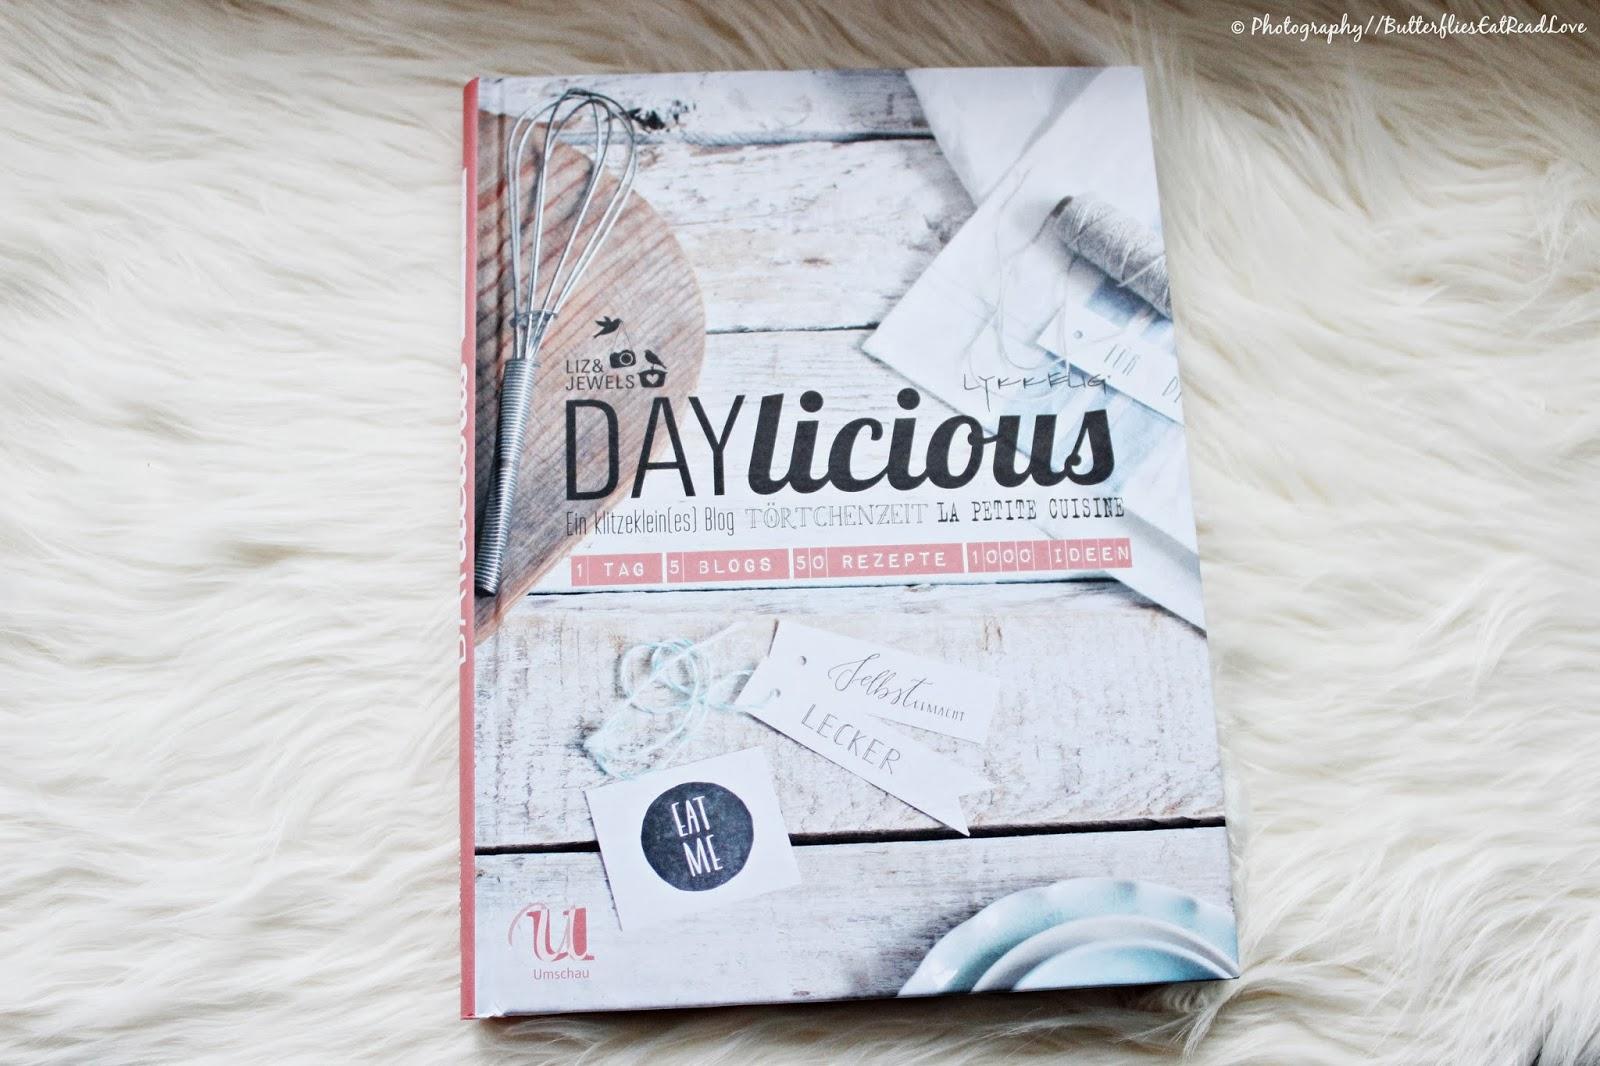 ButterfliesEatReadLove: [Review] DAYlicious: 1 Tag, 5 Blogs ...